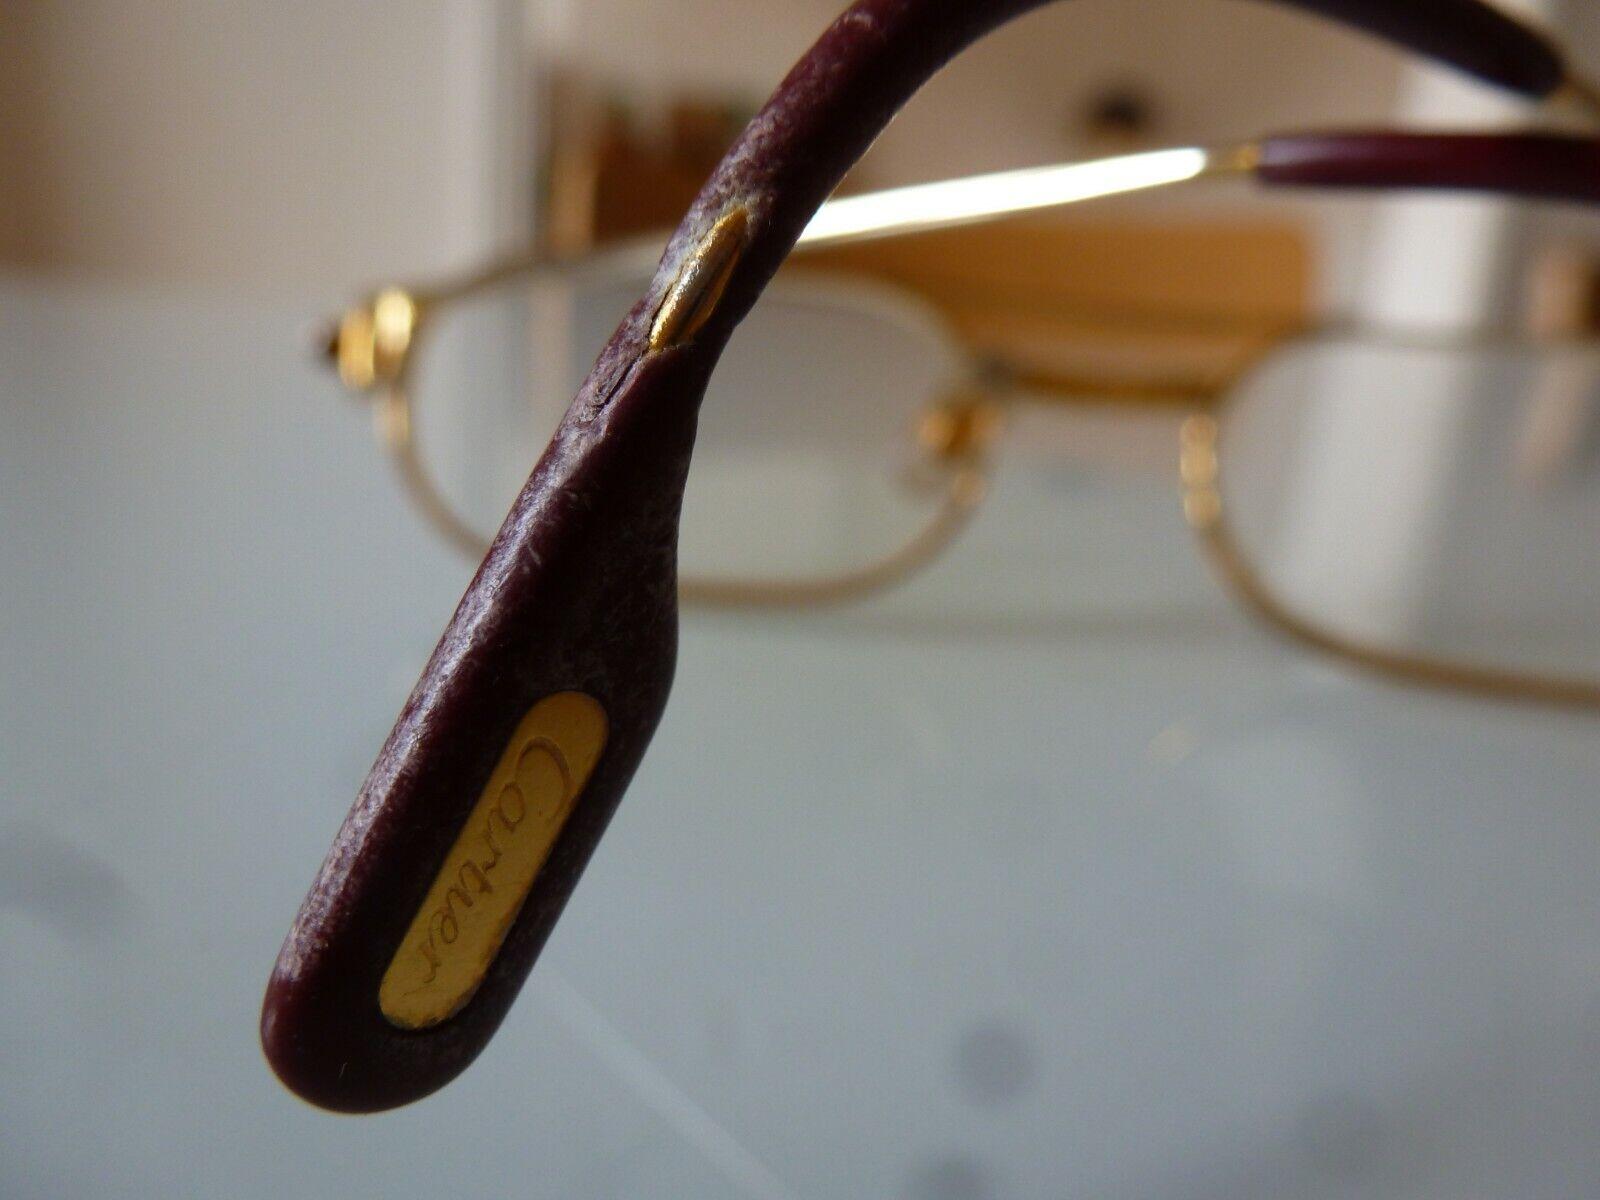 Vintage 80's must cartier paris gold filled eyeglasses 55-20 140 lunettes